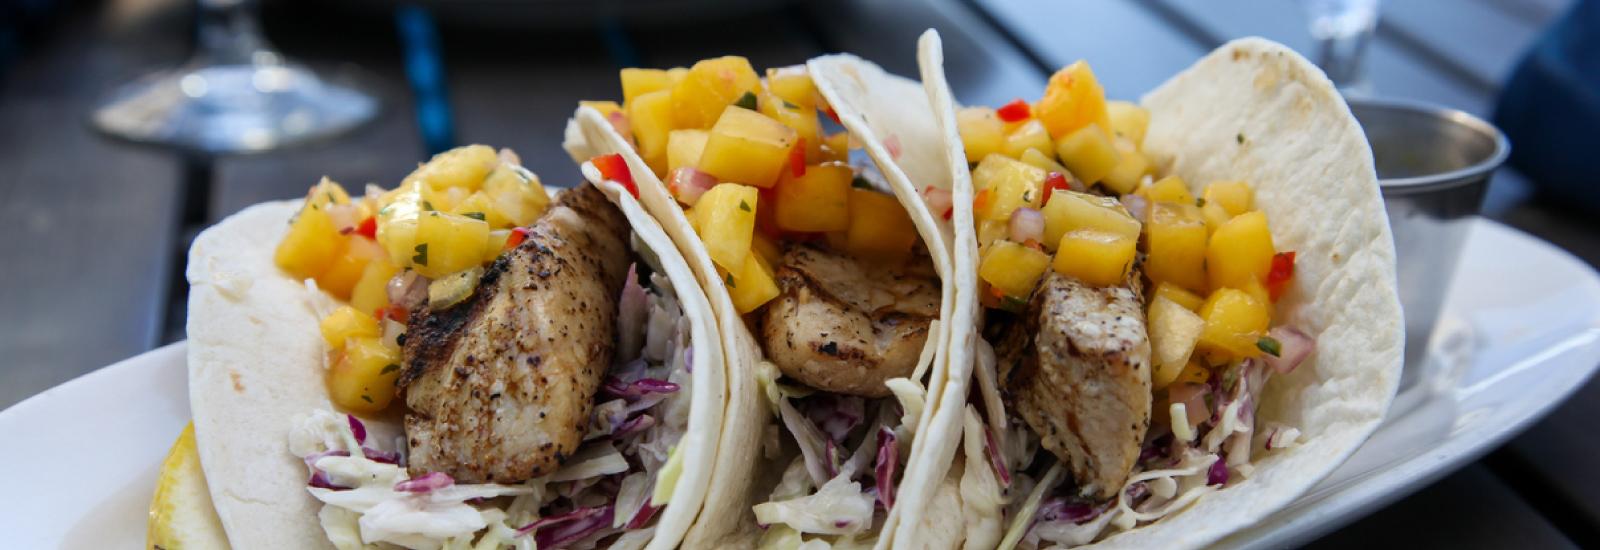 Top 3 TripAdvisor Reviewed Restaurants